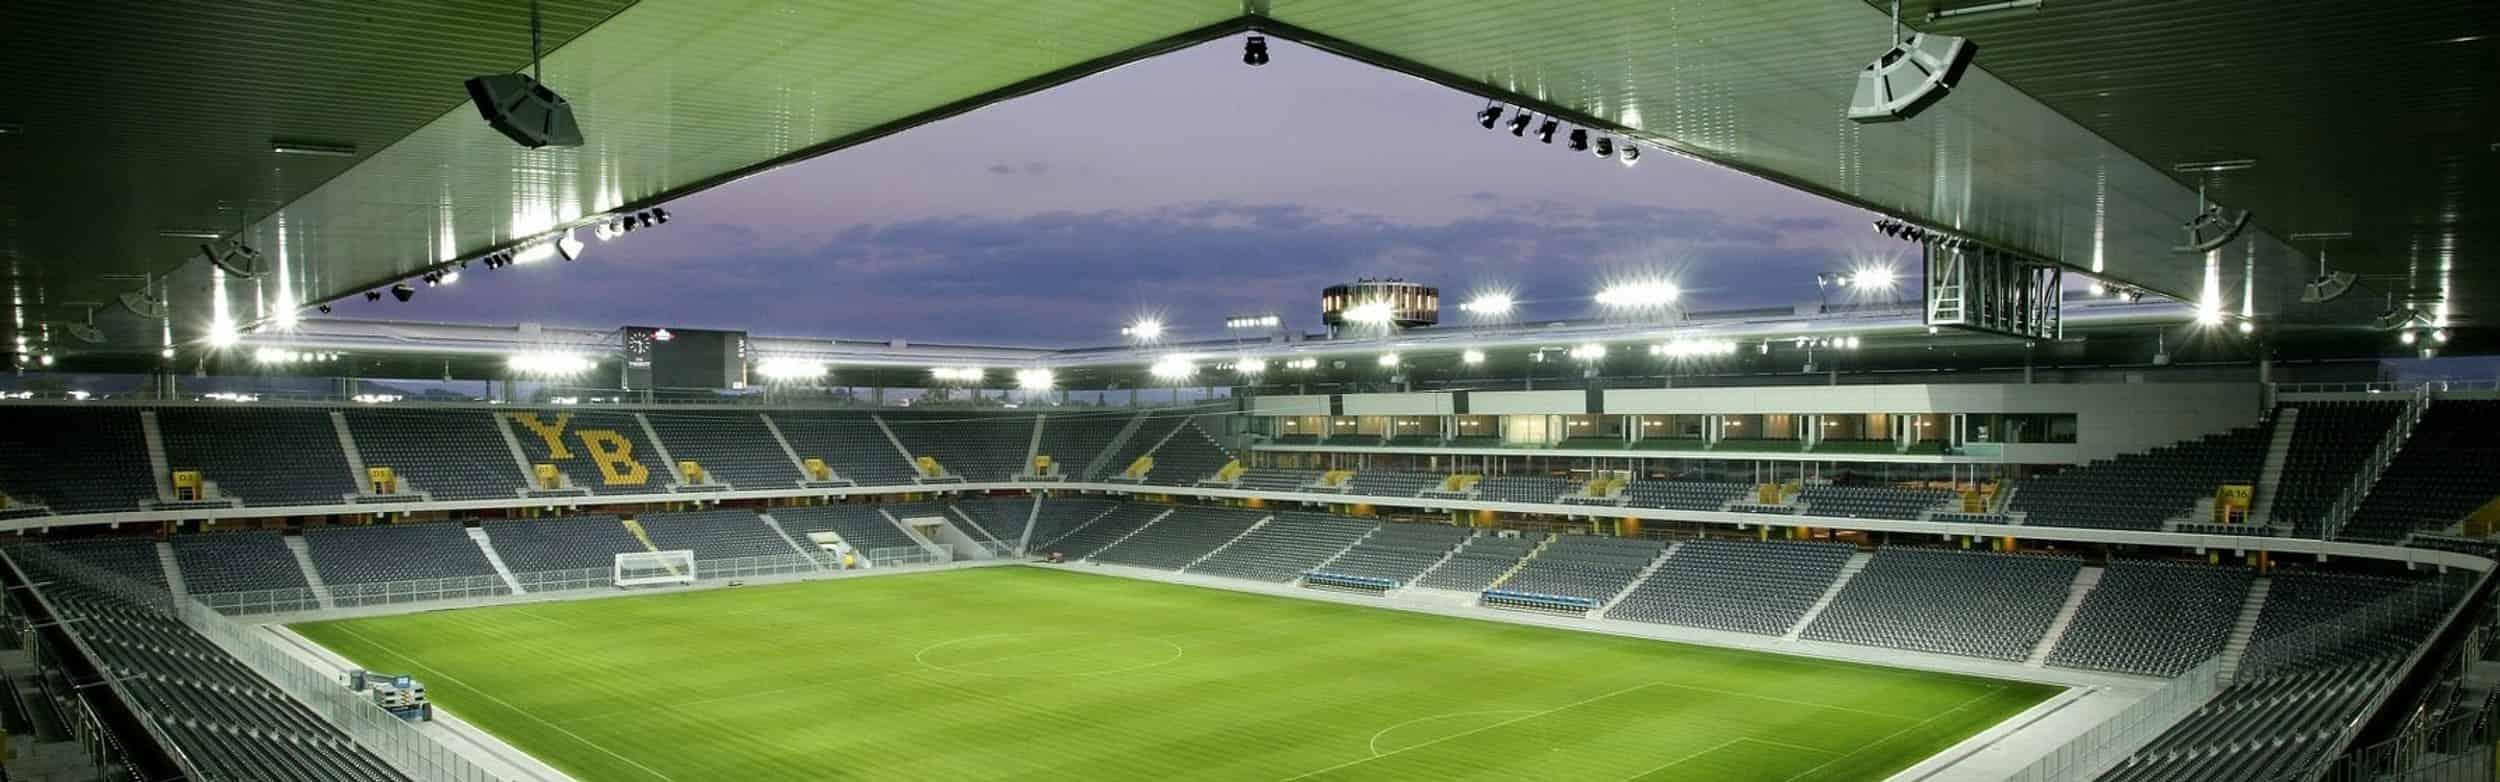 stade-de-suisse-panorama